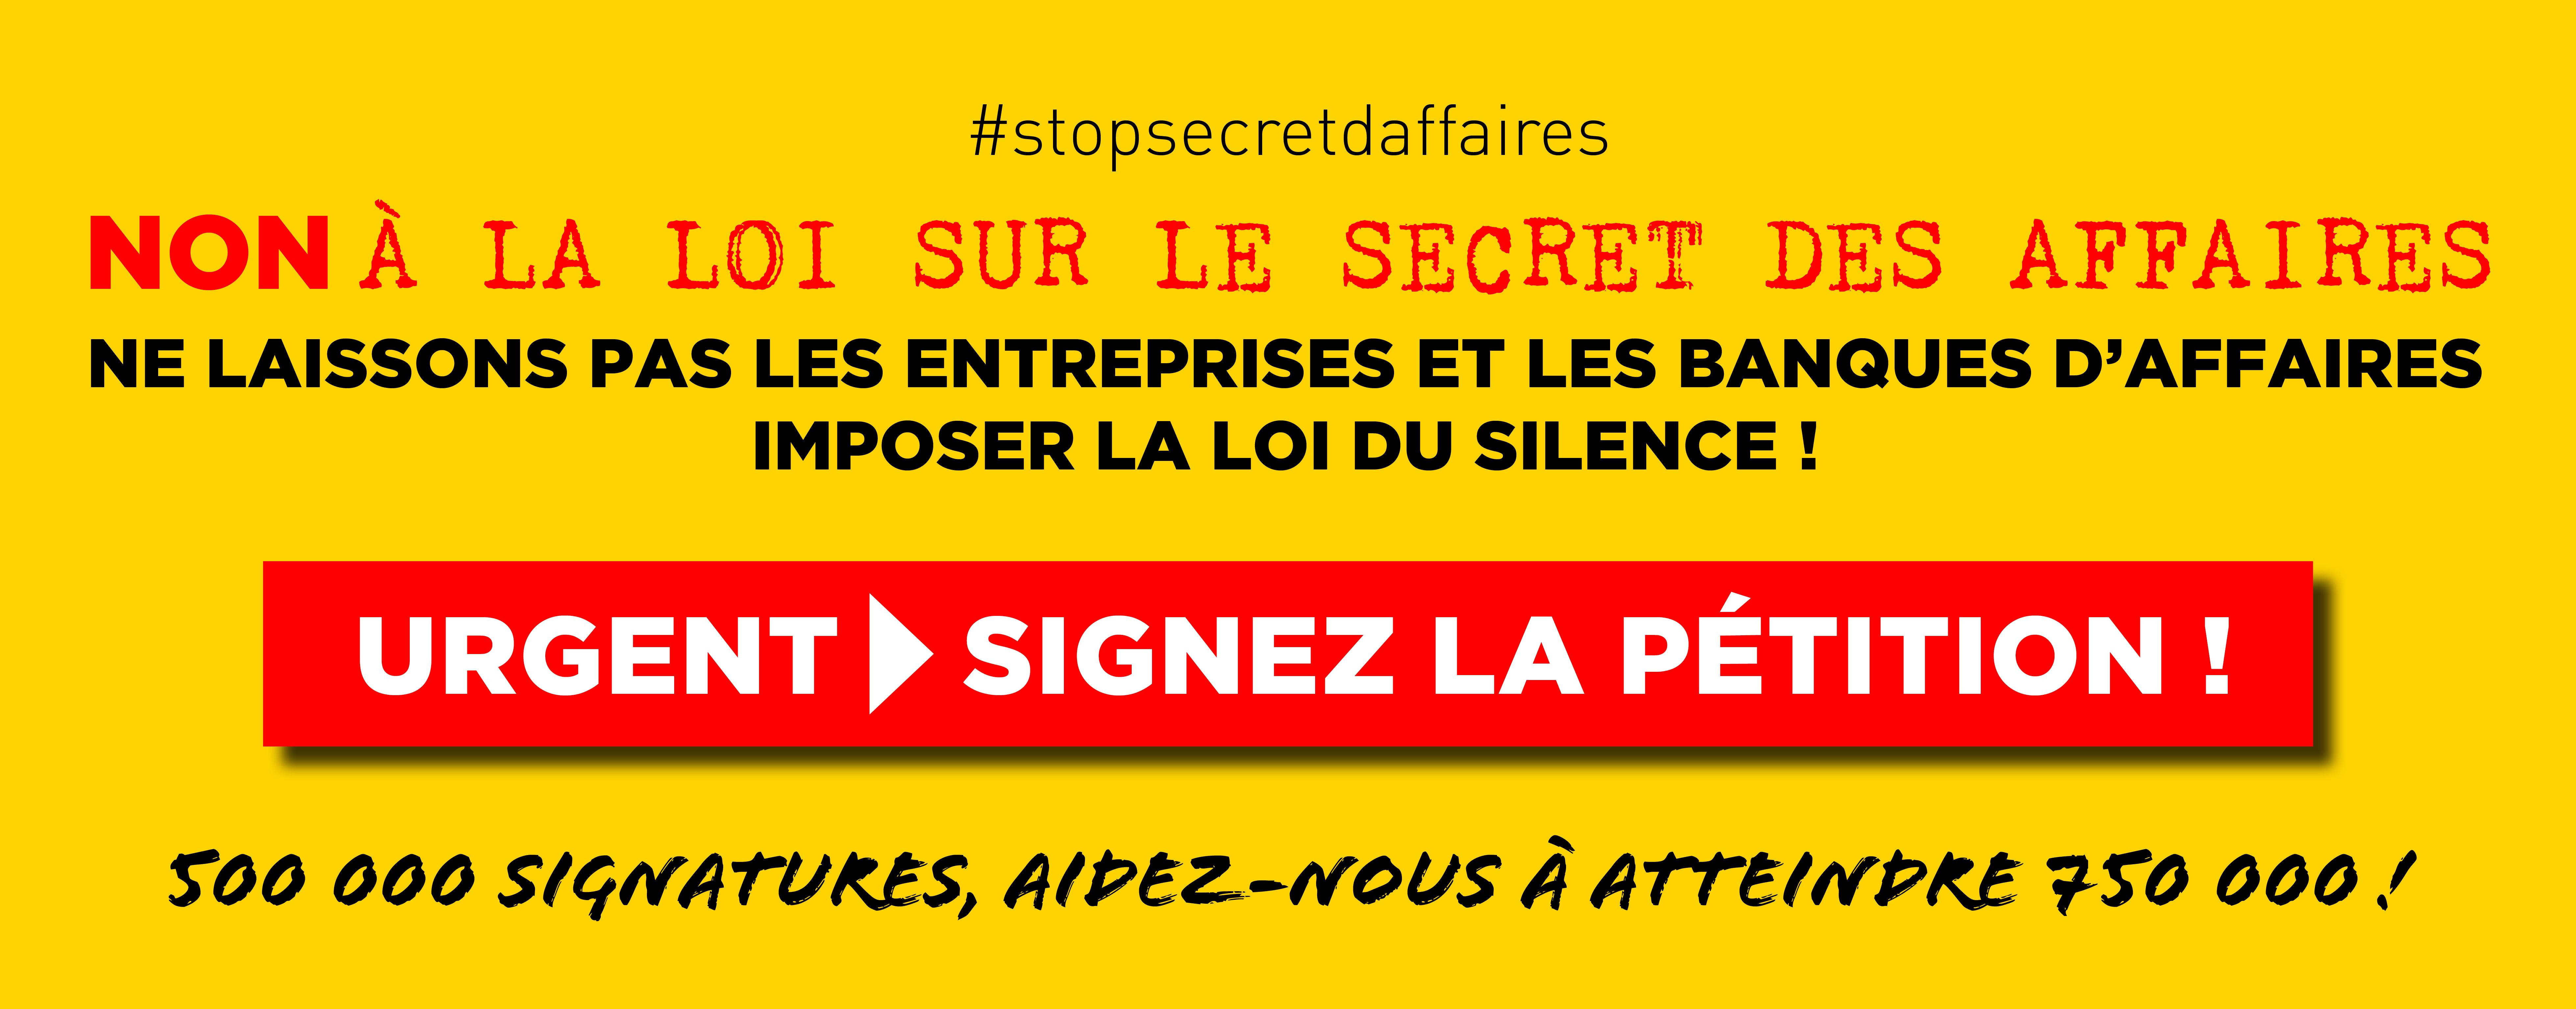 ban-signatures-SITE-500KTO750K